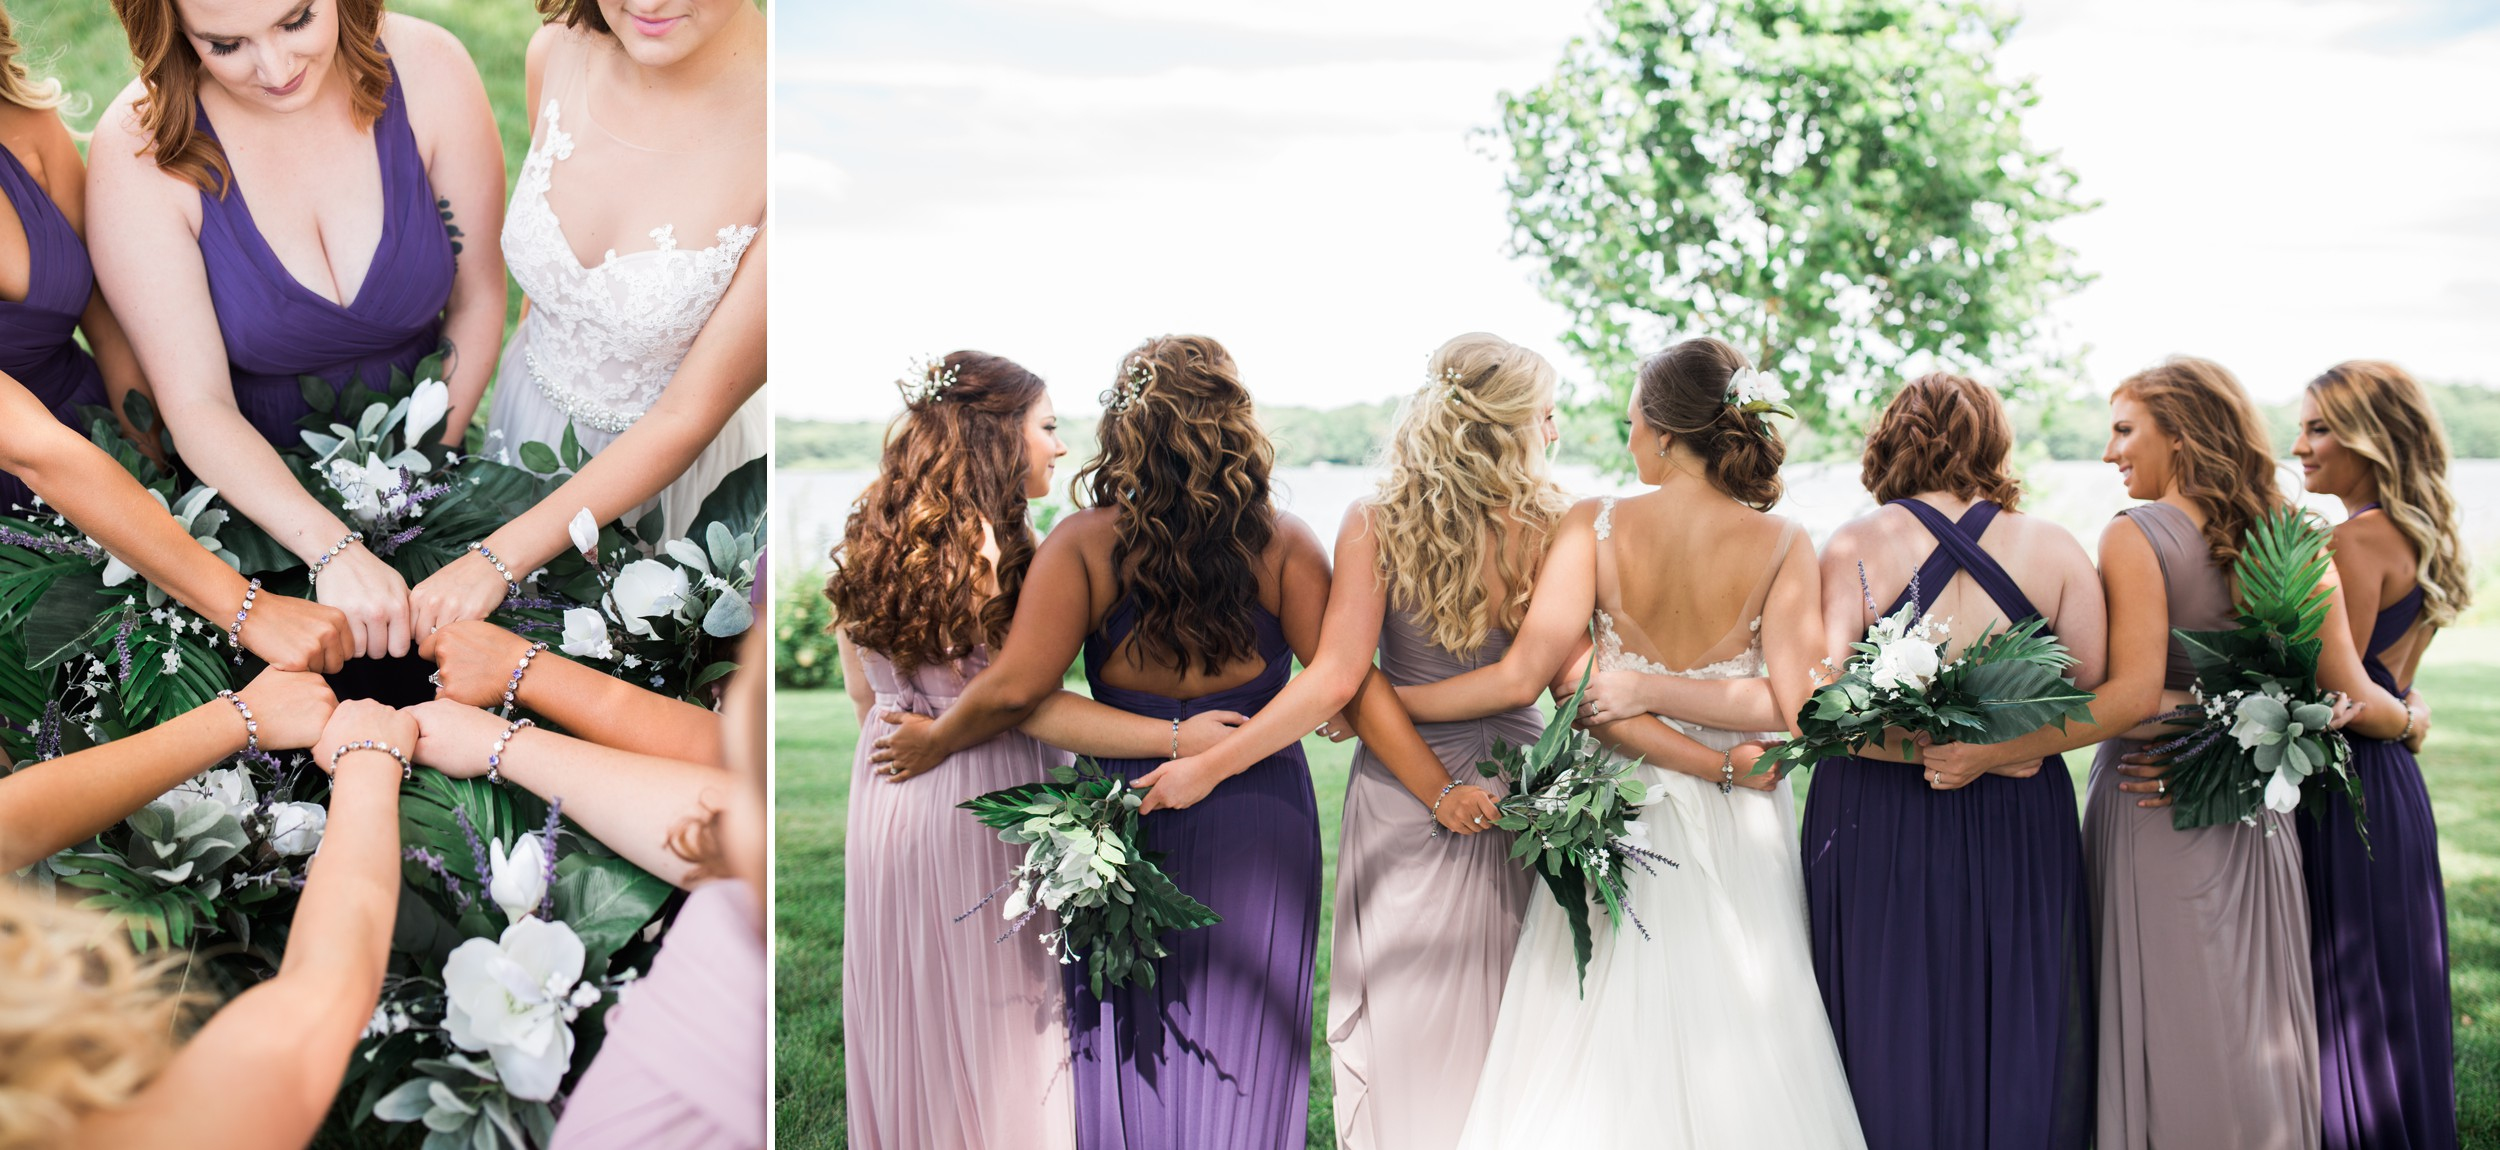 Nick-and-martina-pinelake-vinyards-wedding-columbiana-ohio-tracylynn-photography 7.jpg